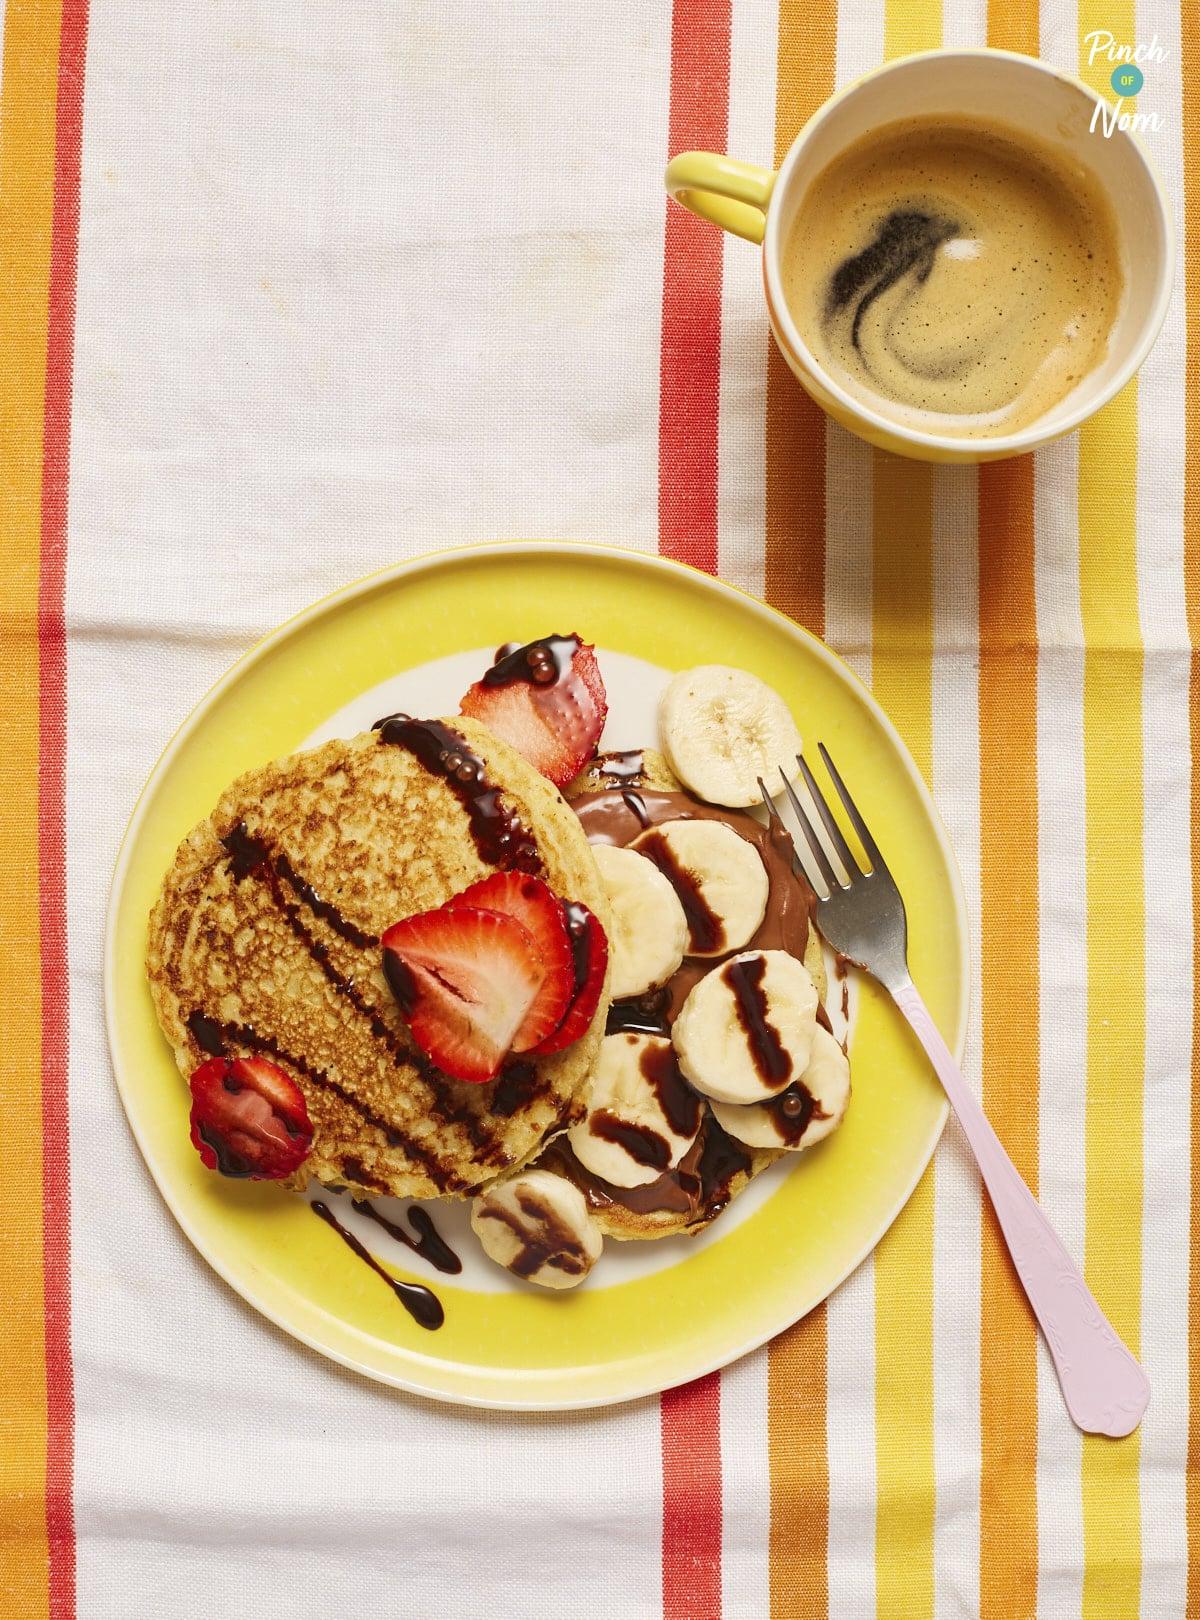 Banana And Chocolate Pancakes Pinch Of Nom